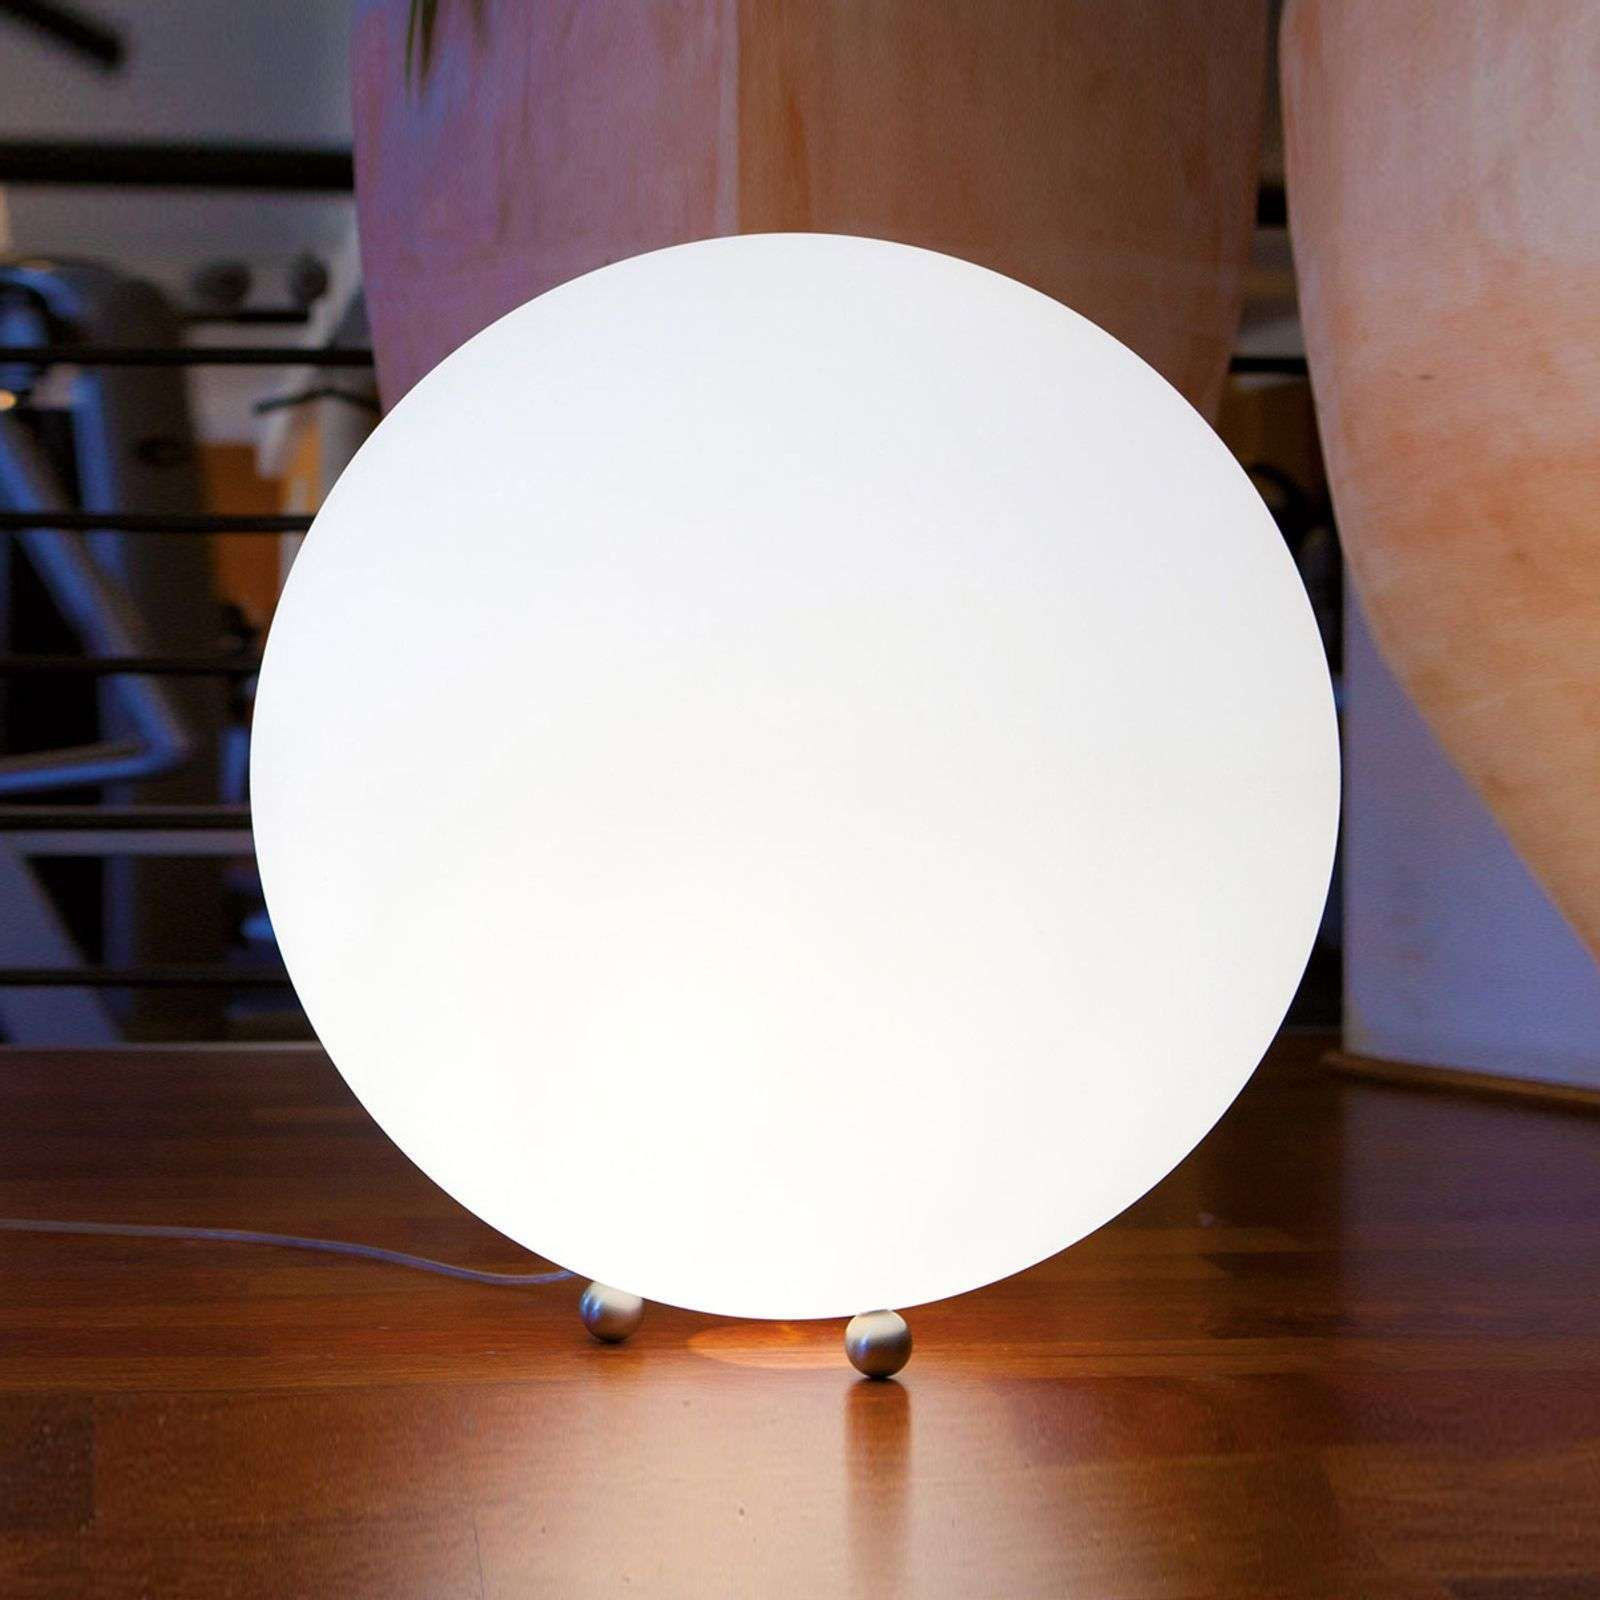 Snowball Un Plafonnier Interieur 30 Cm Plafonnier Luminaires Decoratifs Et Plafonnier Exterieur